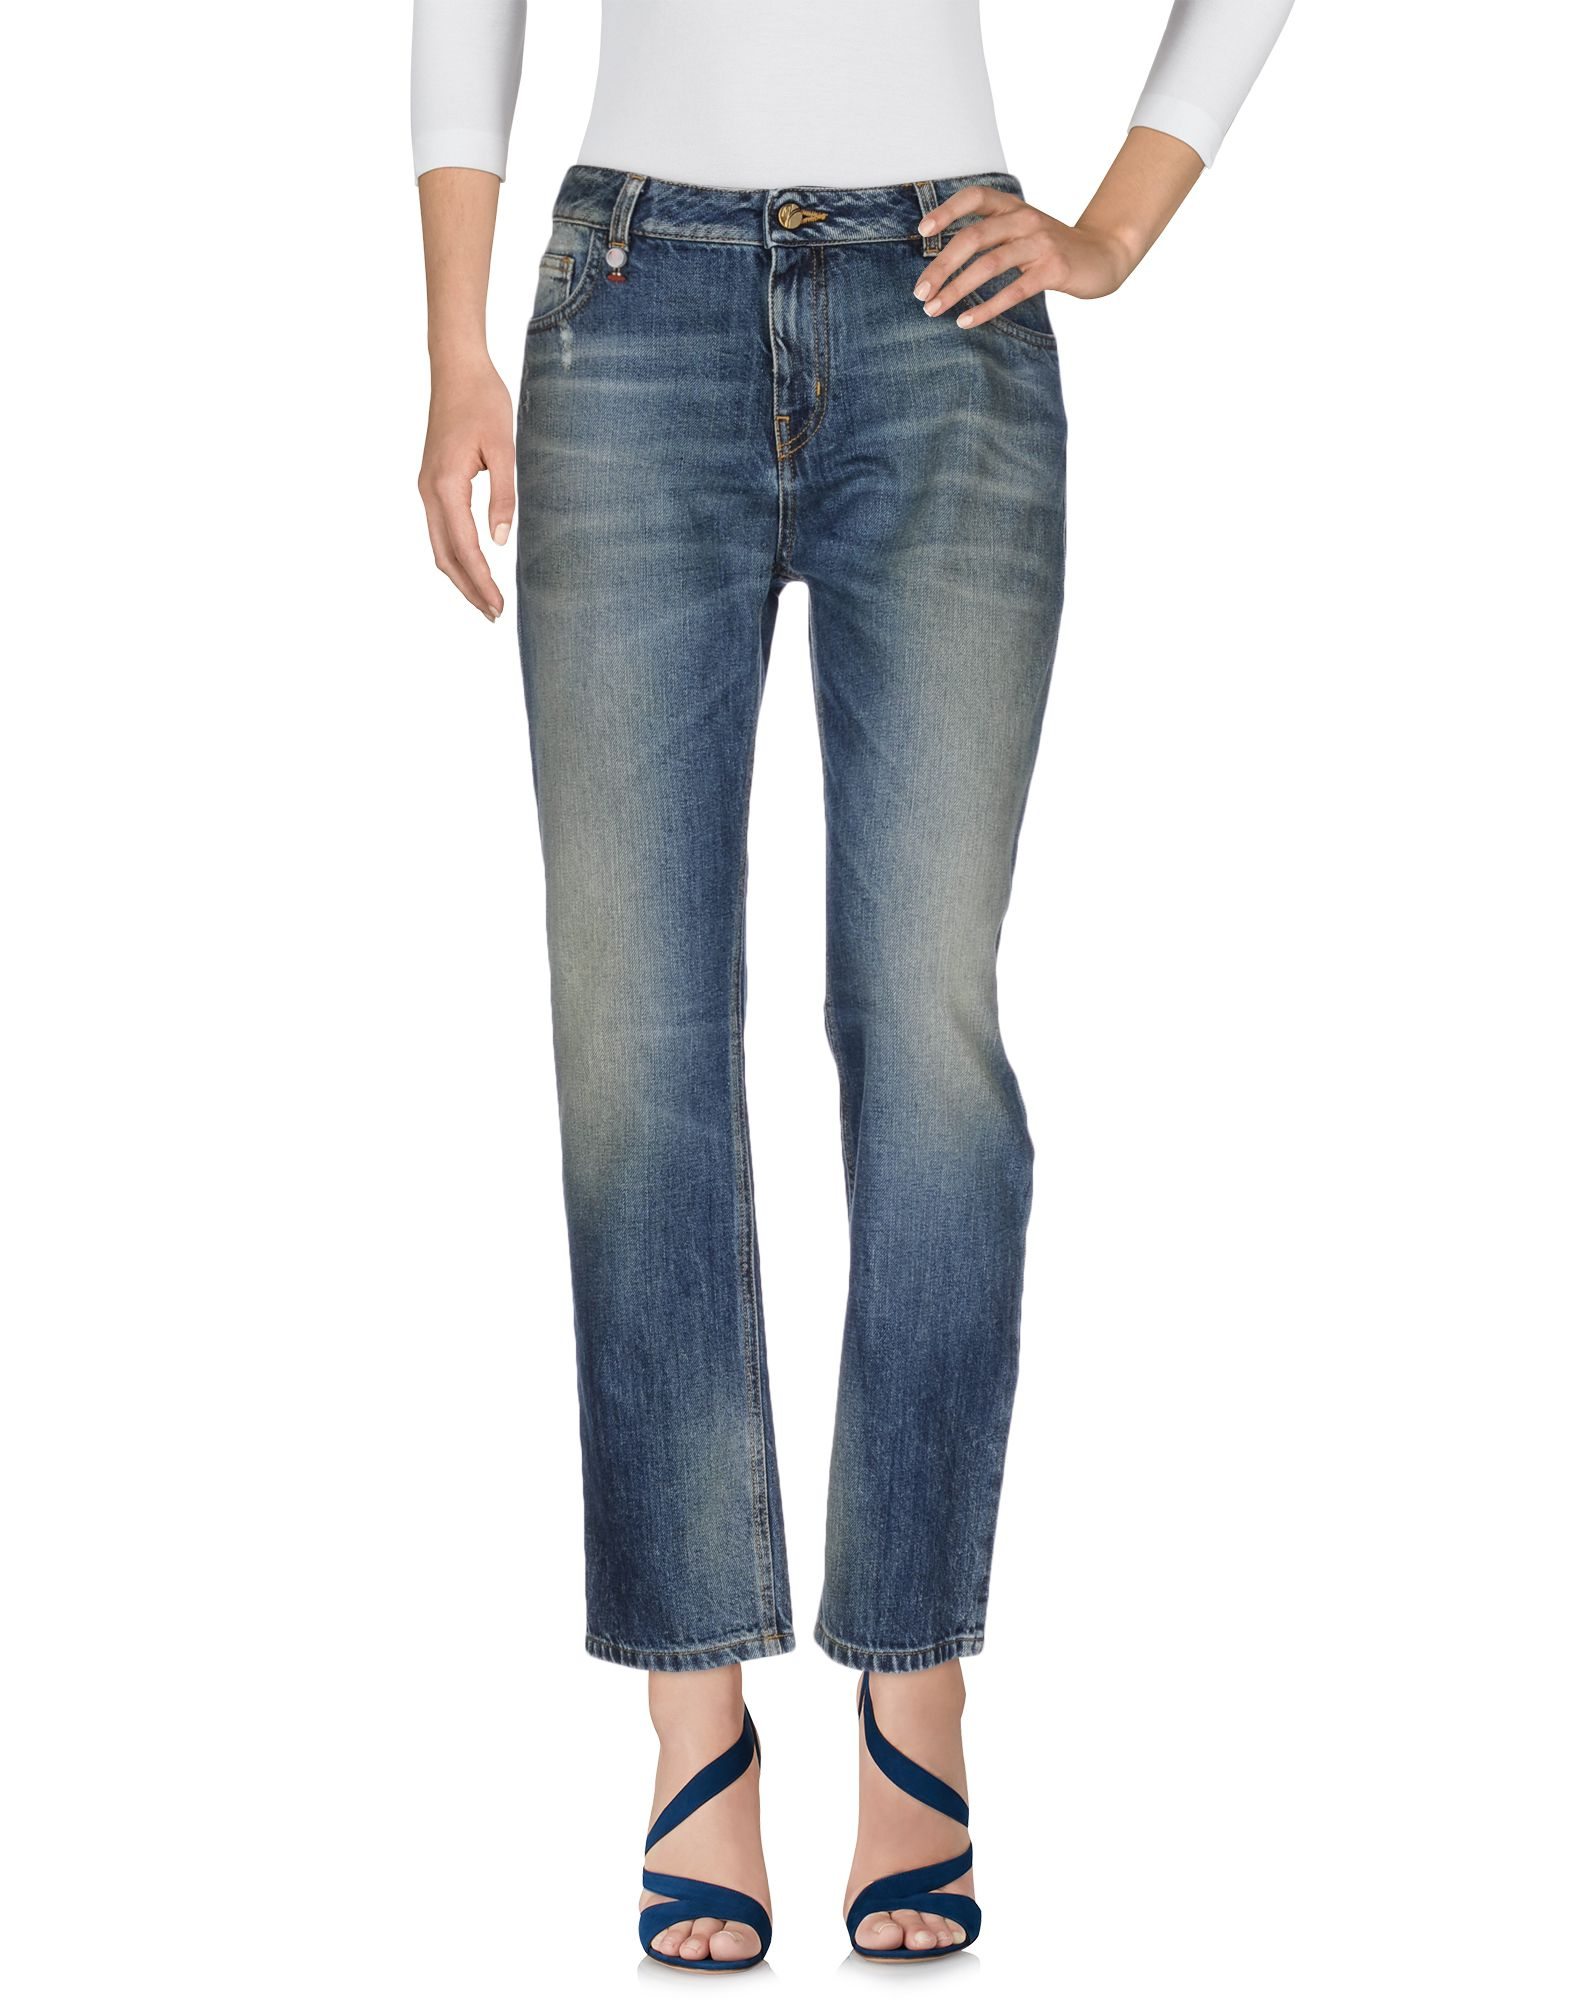 Pantaloni Jeans Manila Grace Denim Donna - Acquista online su Doyh1